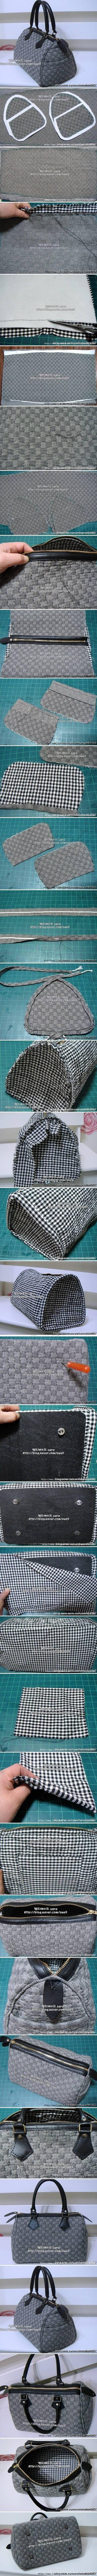 DIY Nice Fashionable Handbag fashion nice handbag diy easy crafts diy ideas diy…